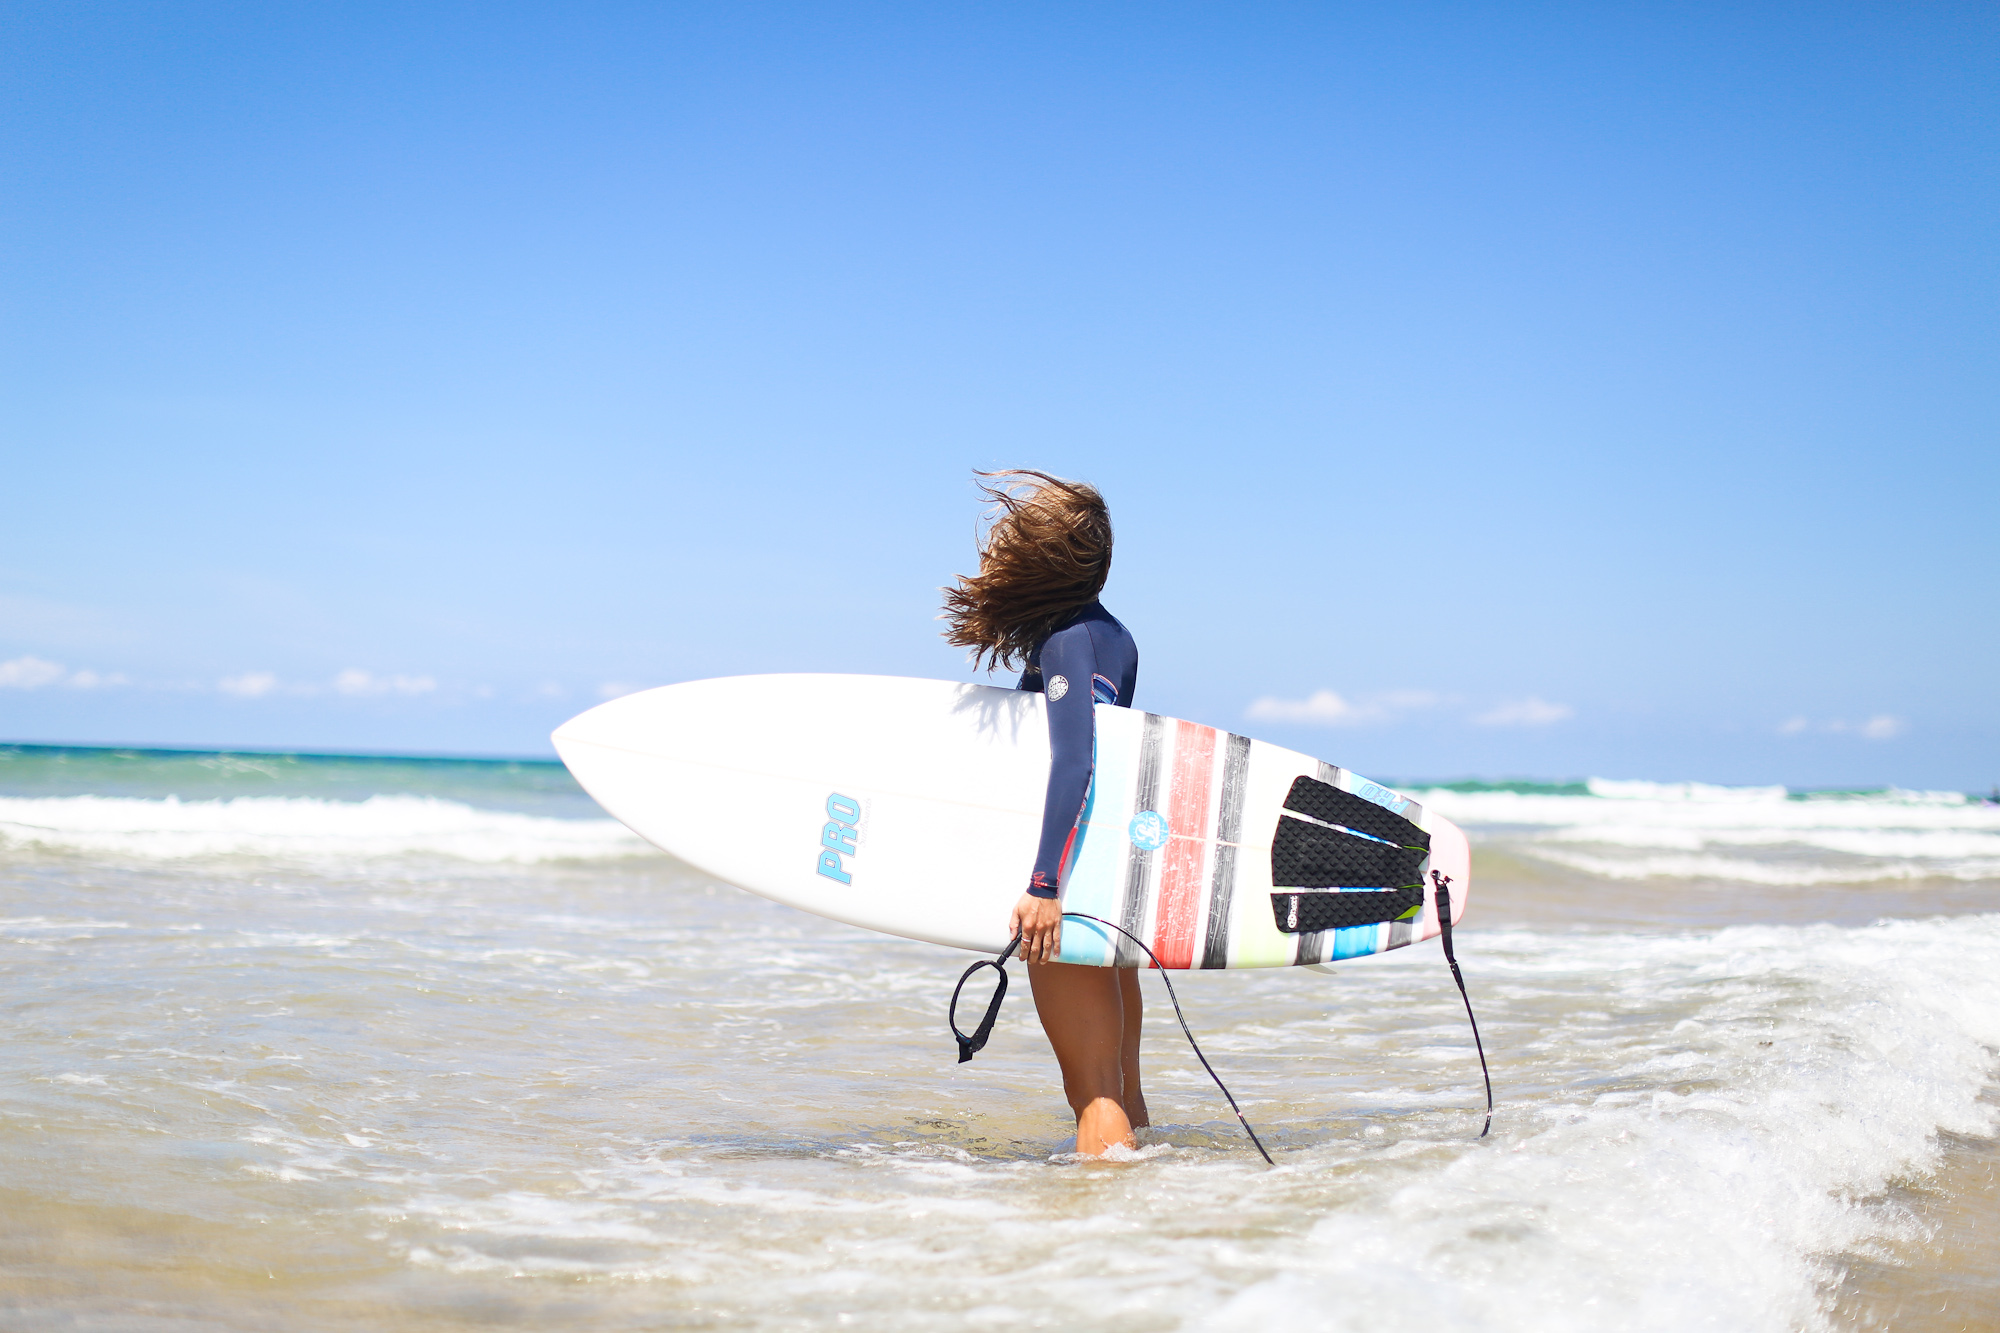 Clochet_surf_rip_curl_bombshell_wetsuit_jpg